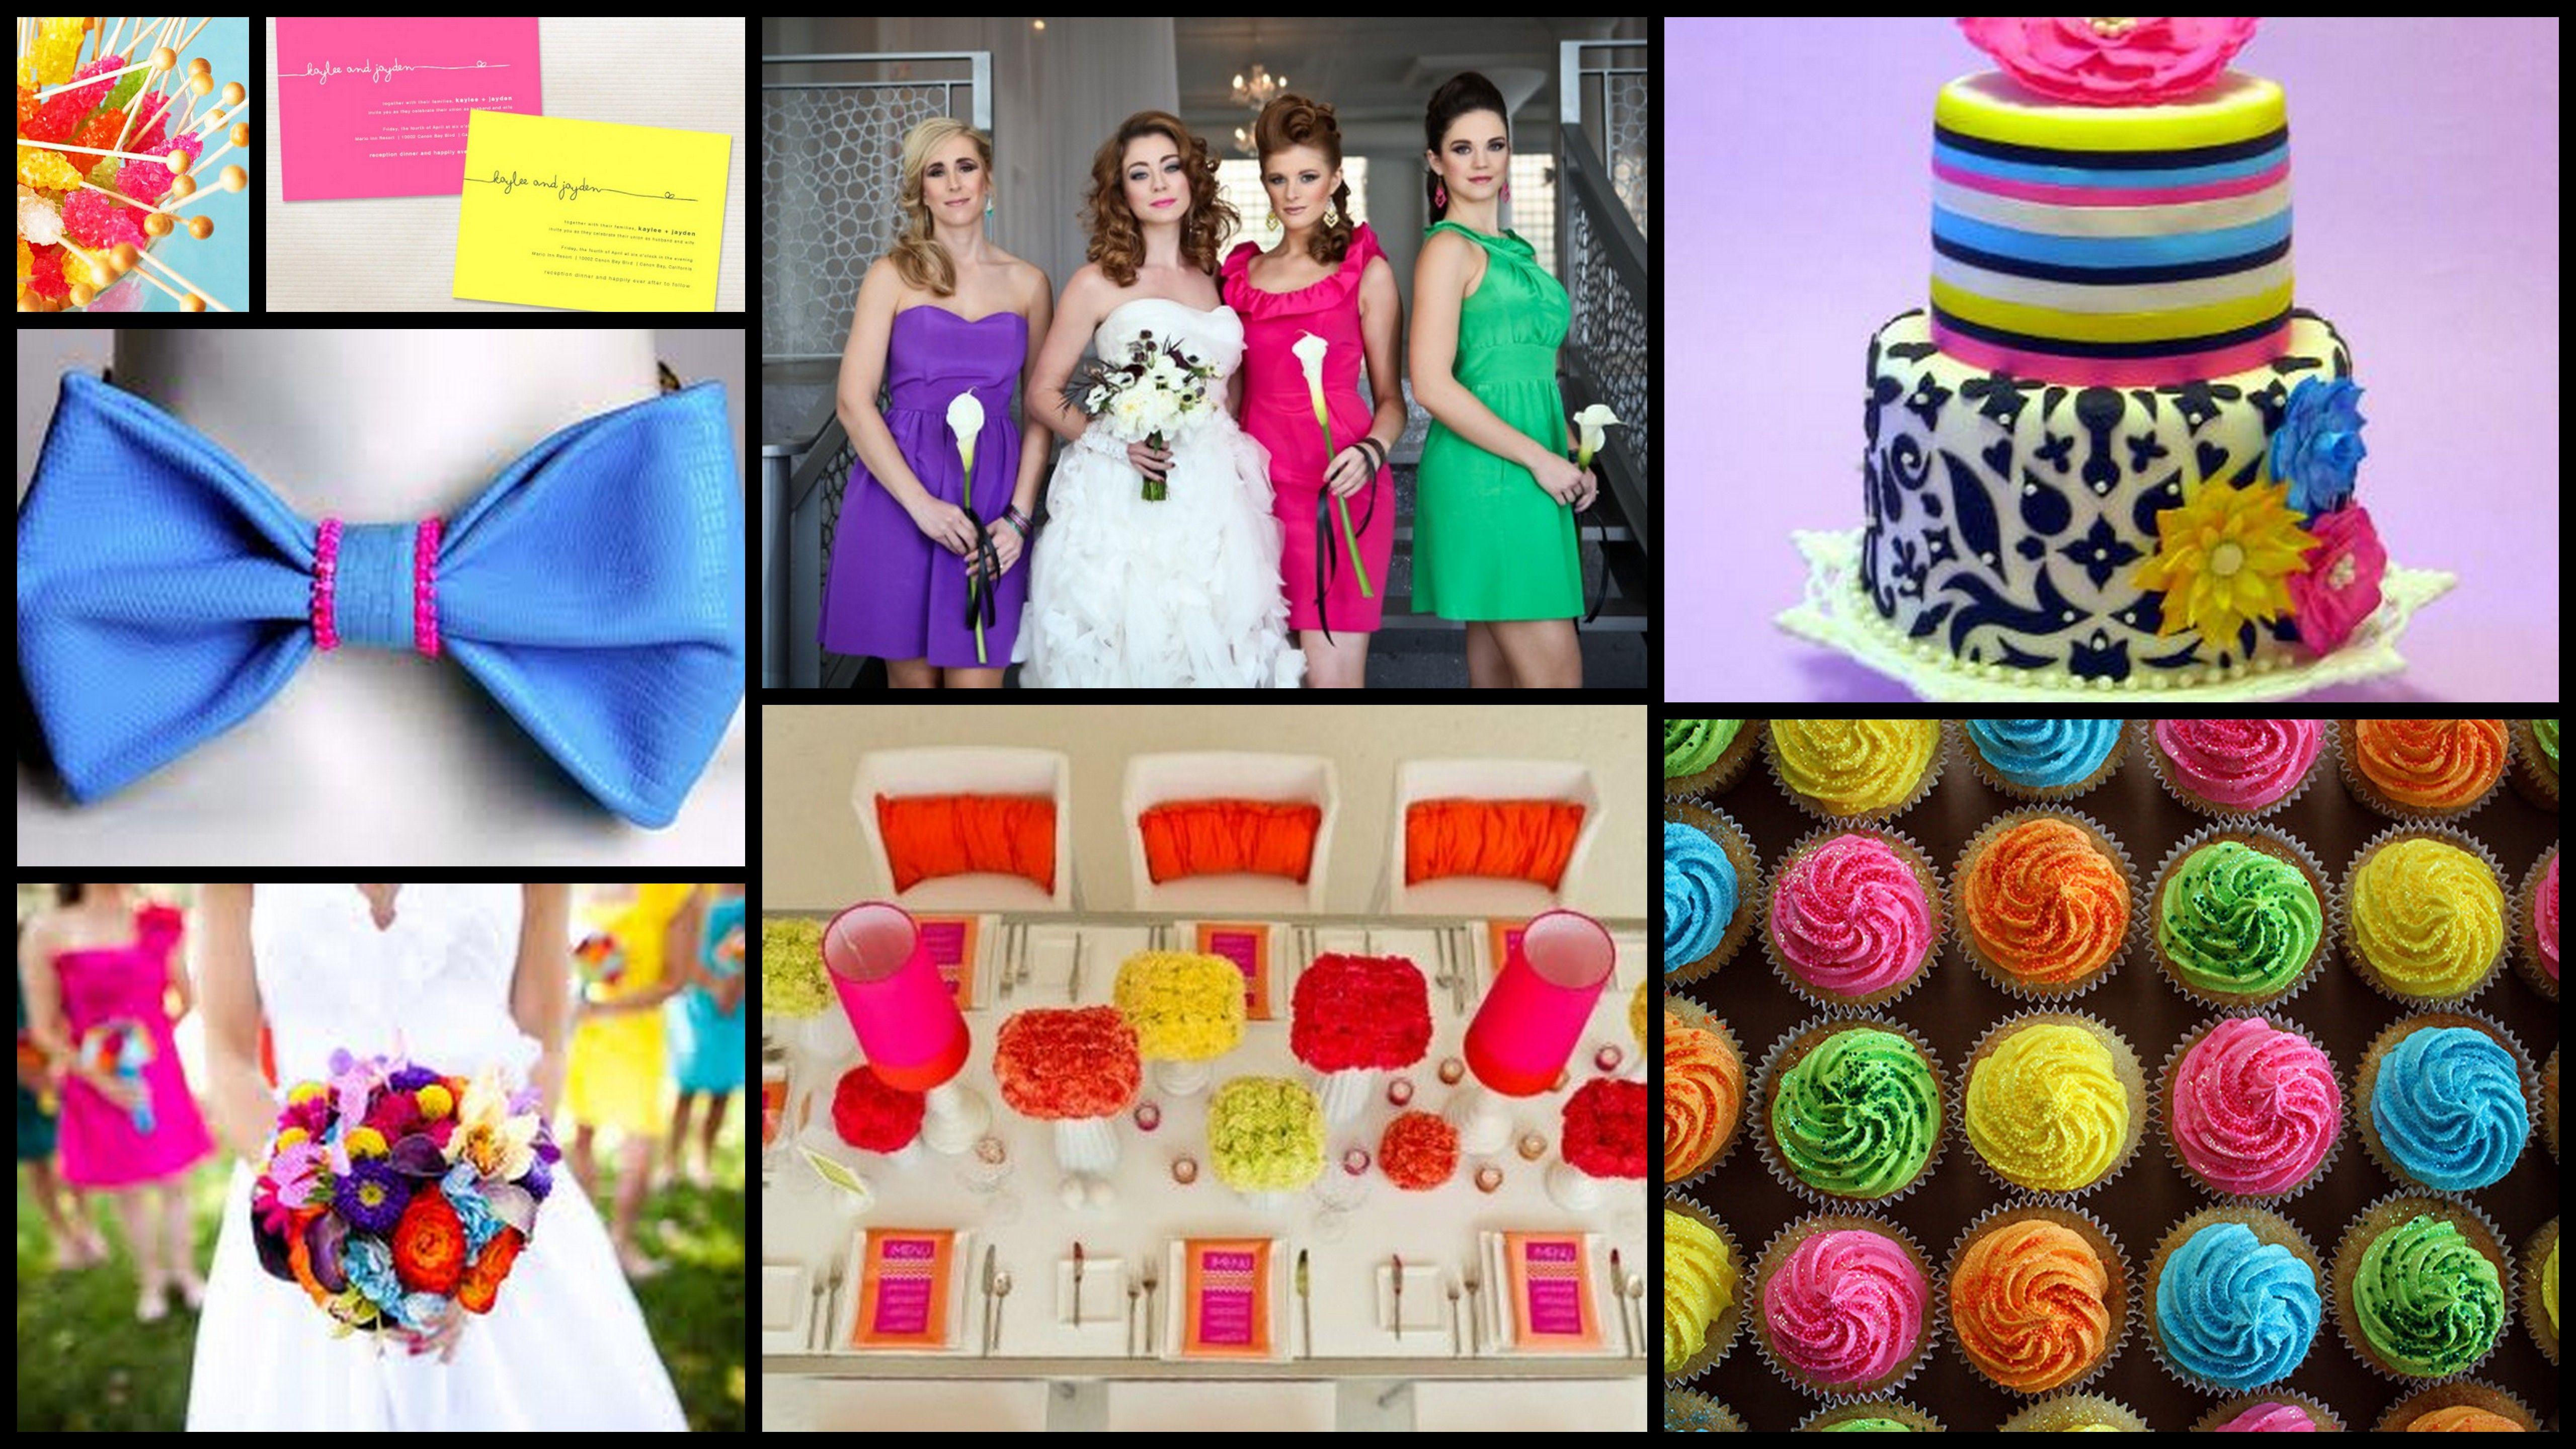 80s Wedding Cake Google Search 80s Party Pinterest Neon